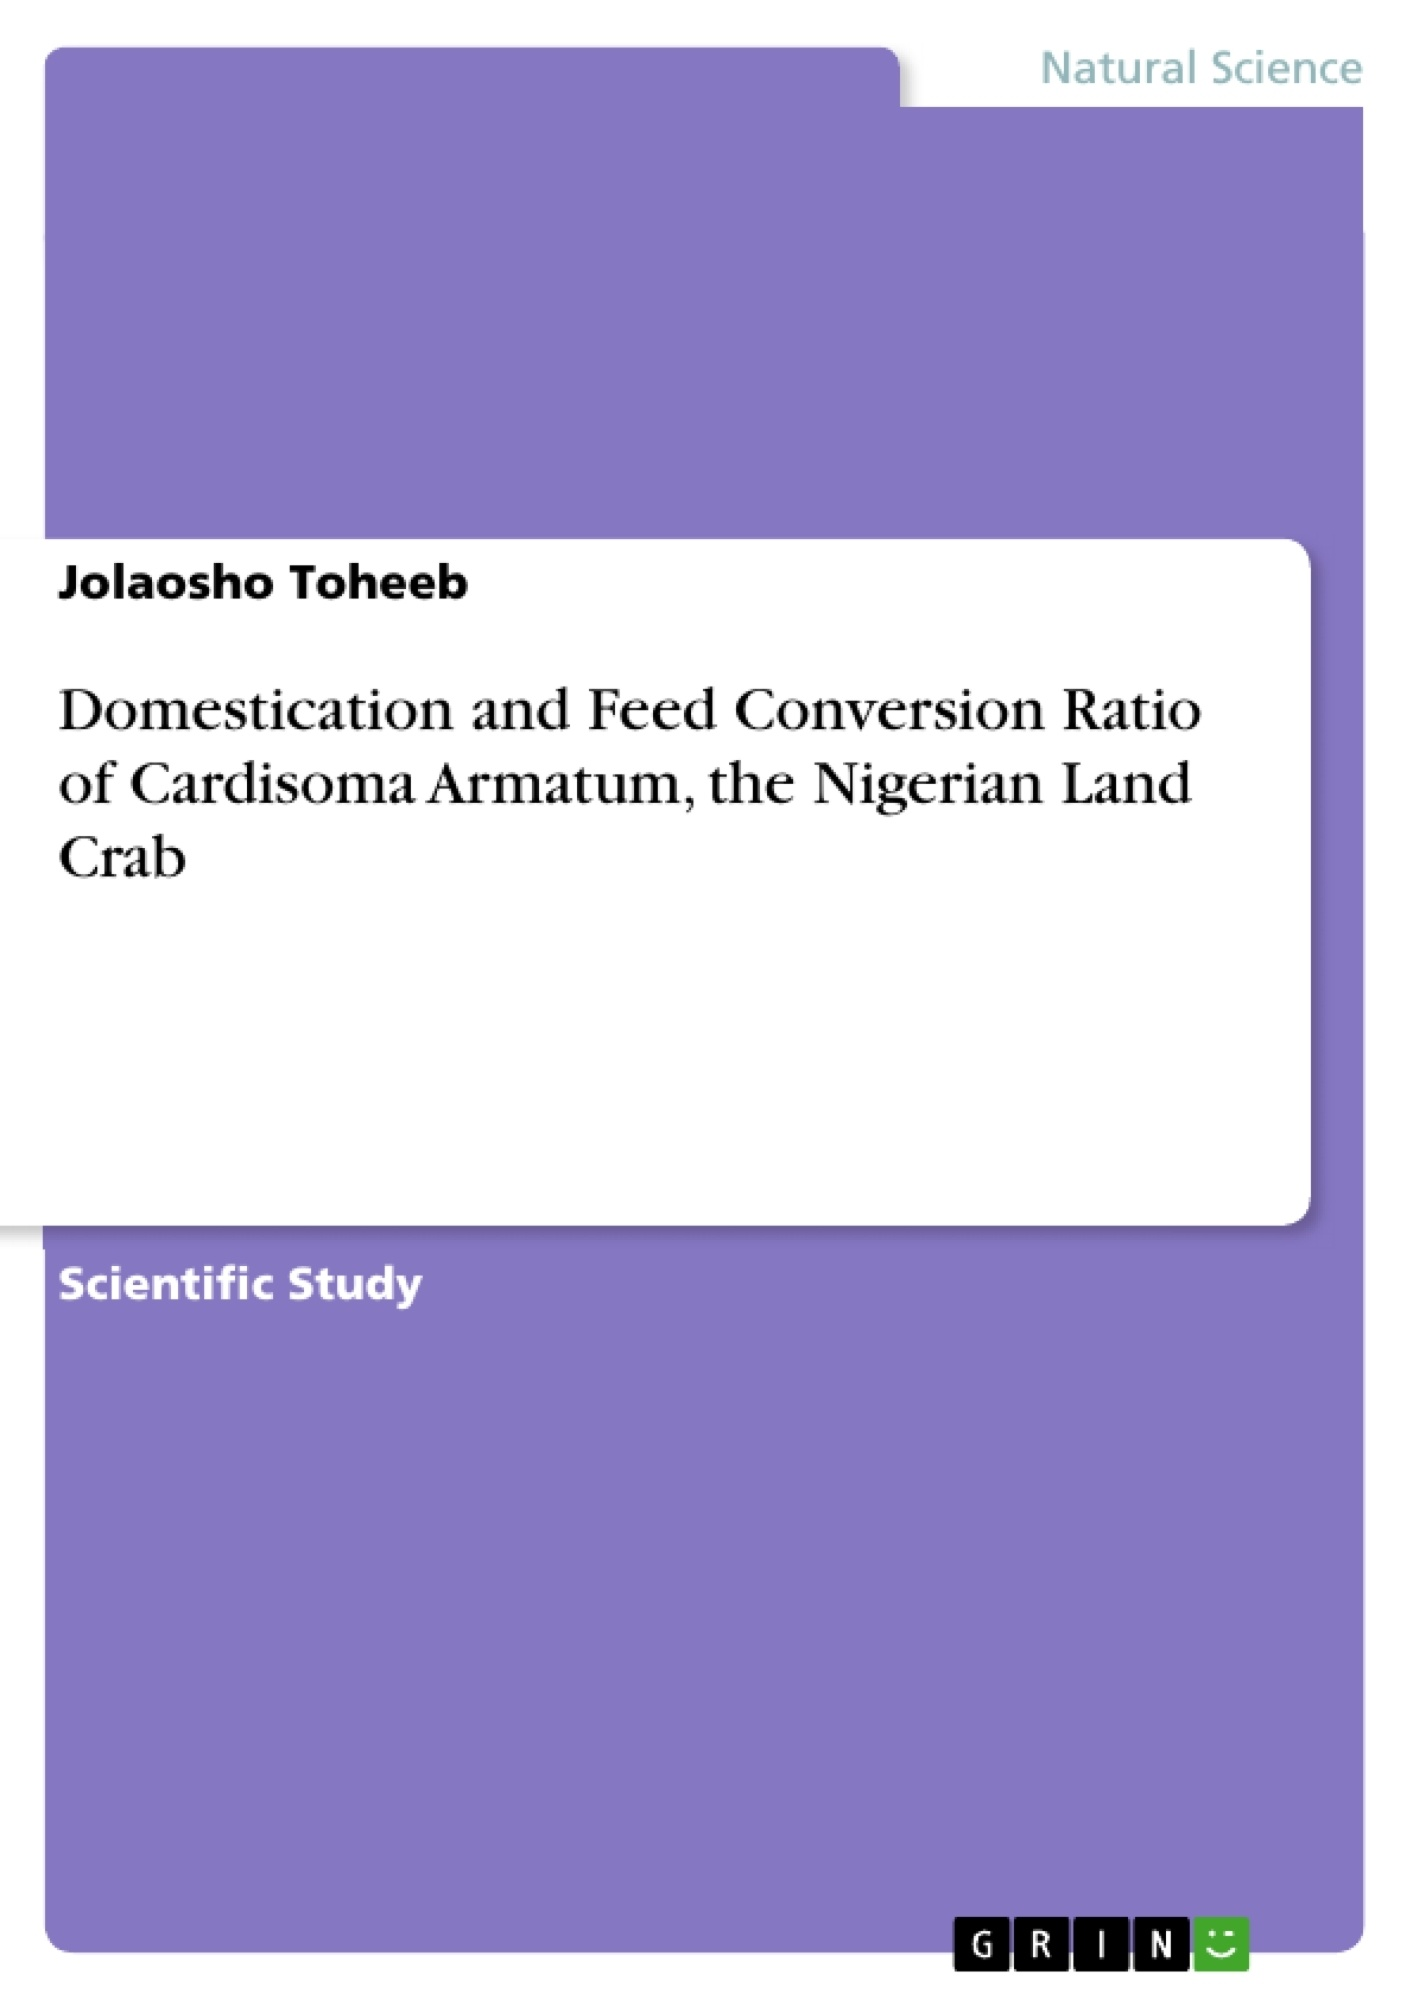 Title: Domestication and Feed Conversion Ratio of Cardisoma Armatum, the Nigerian Land Crab